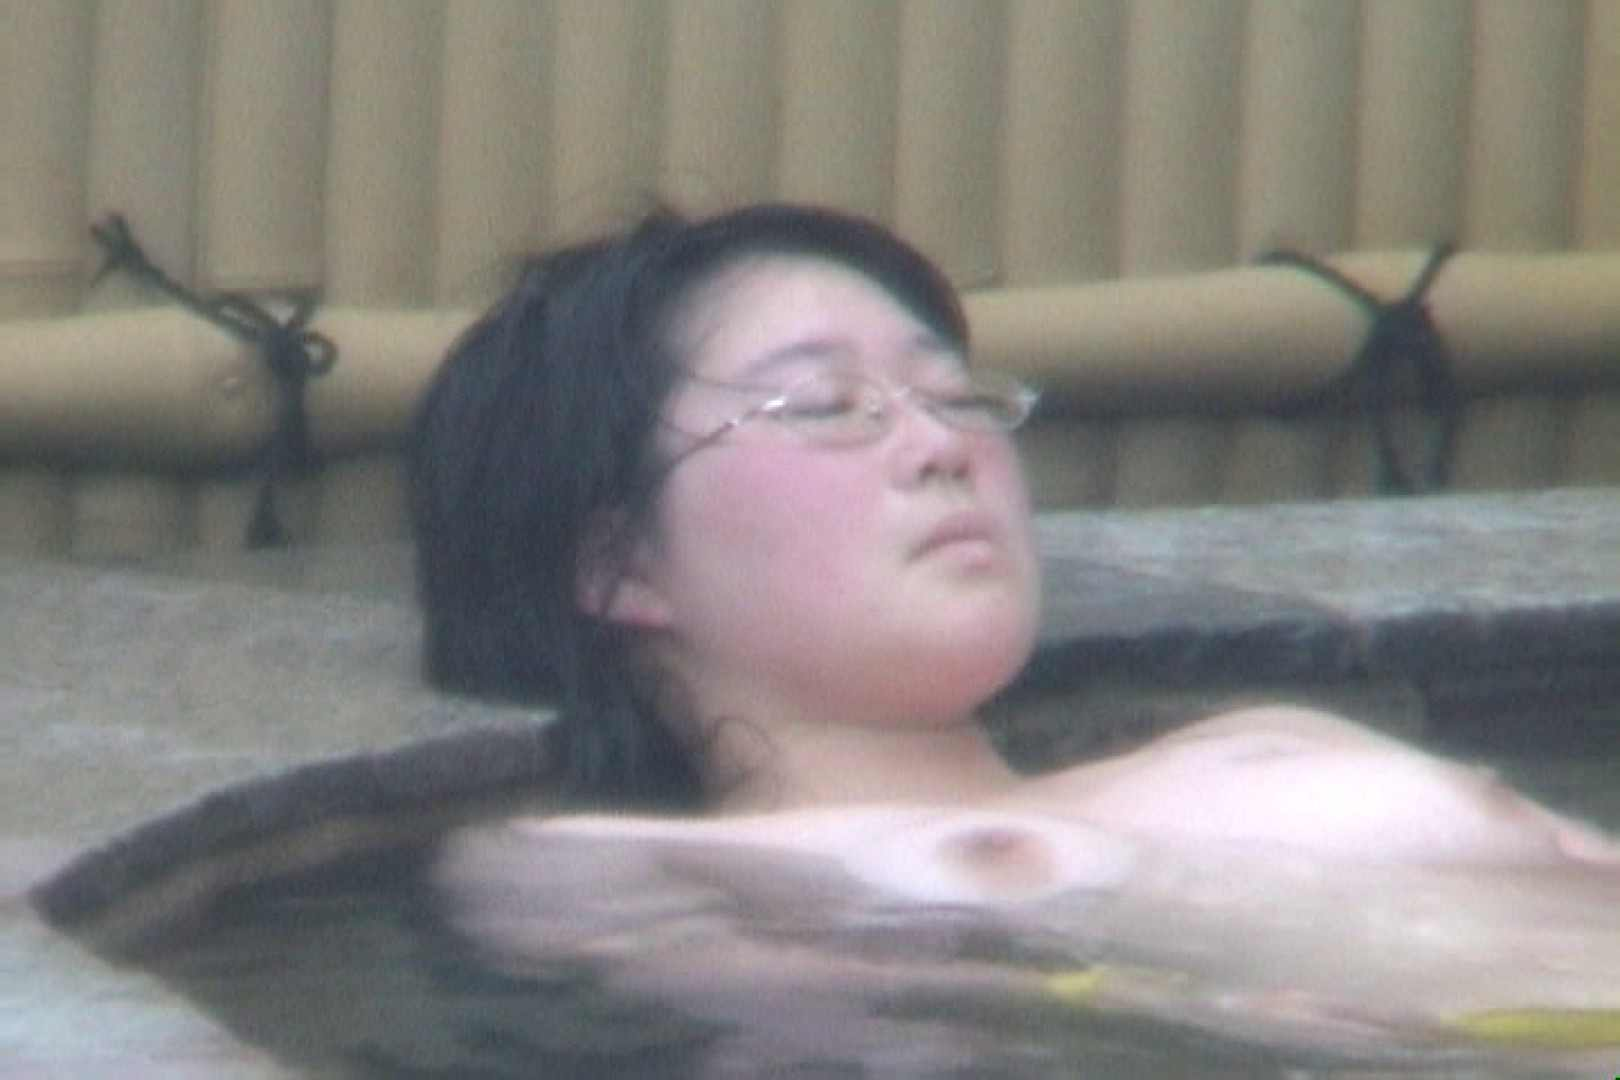 Aquaな露天風呂Vol.46【VIP限定】 HなOL | 露天  90pic 12